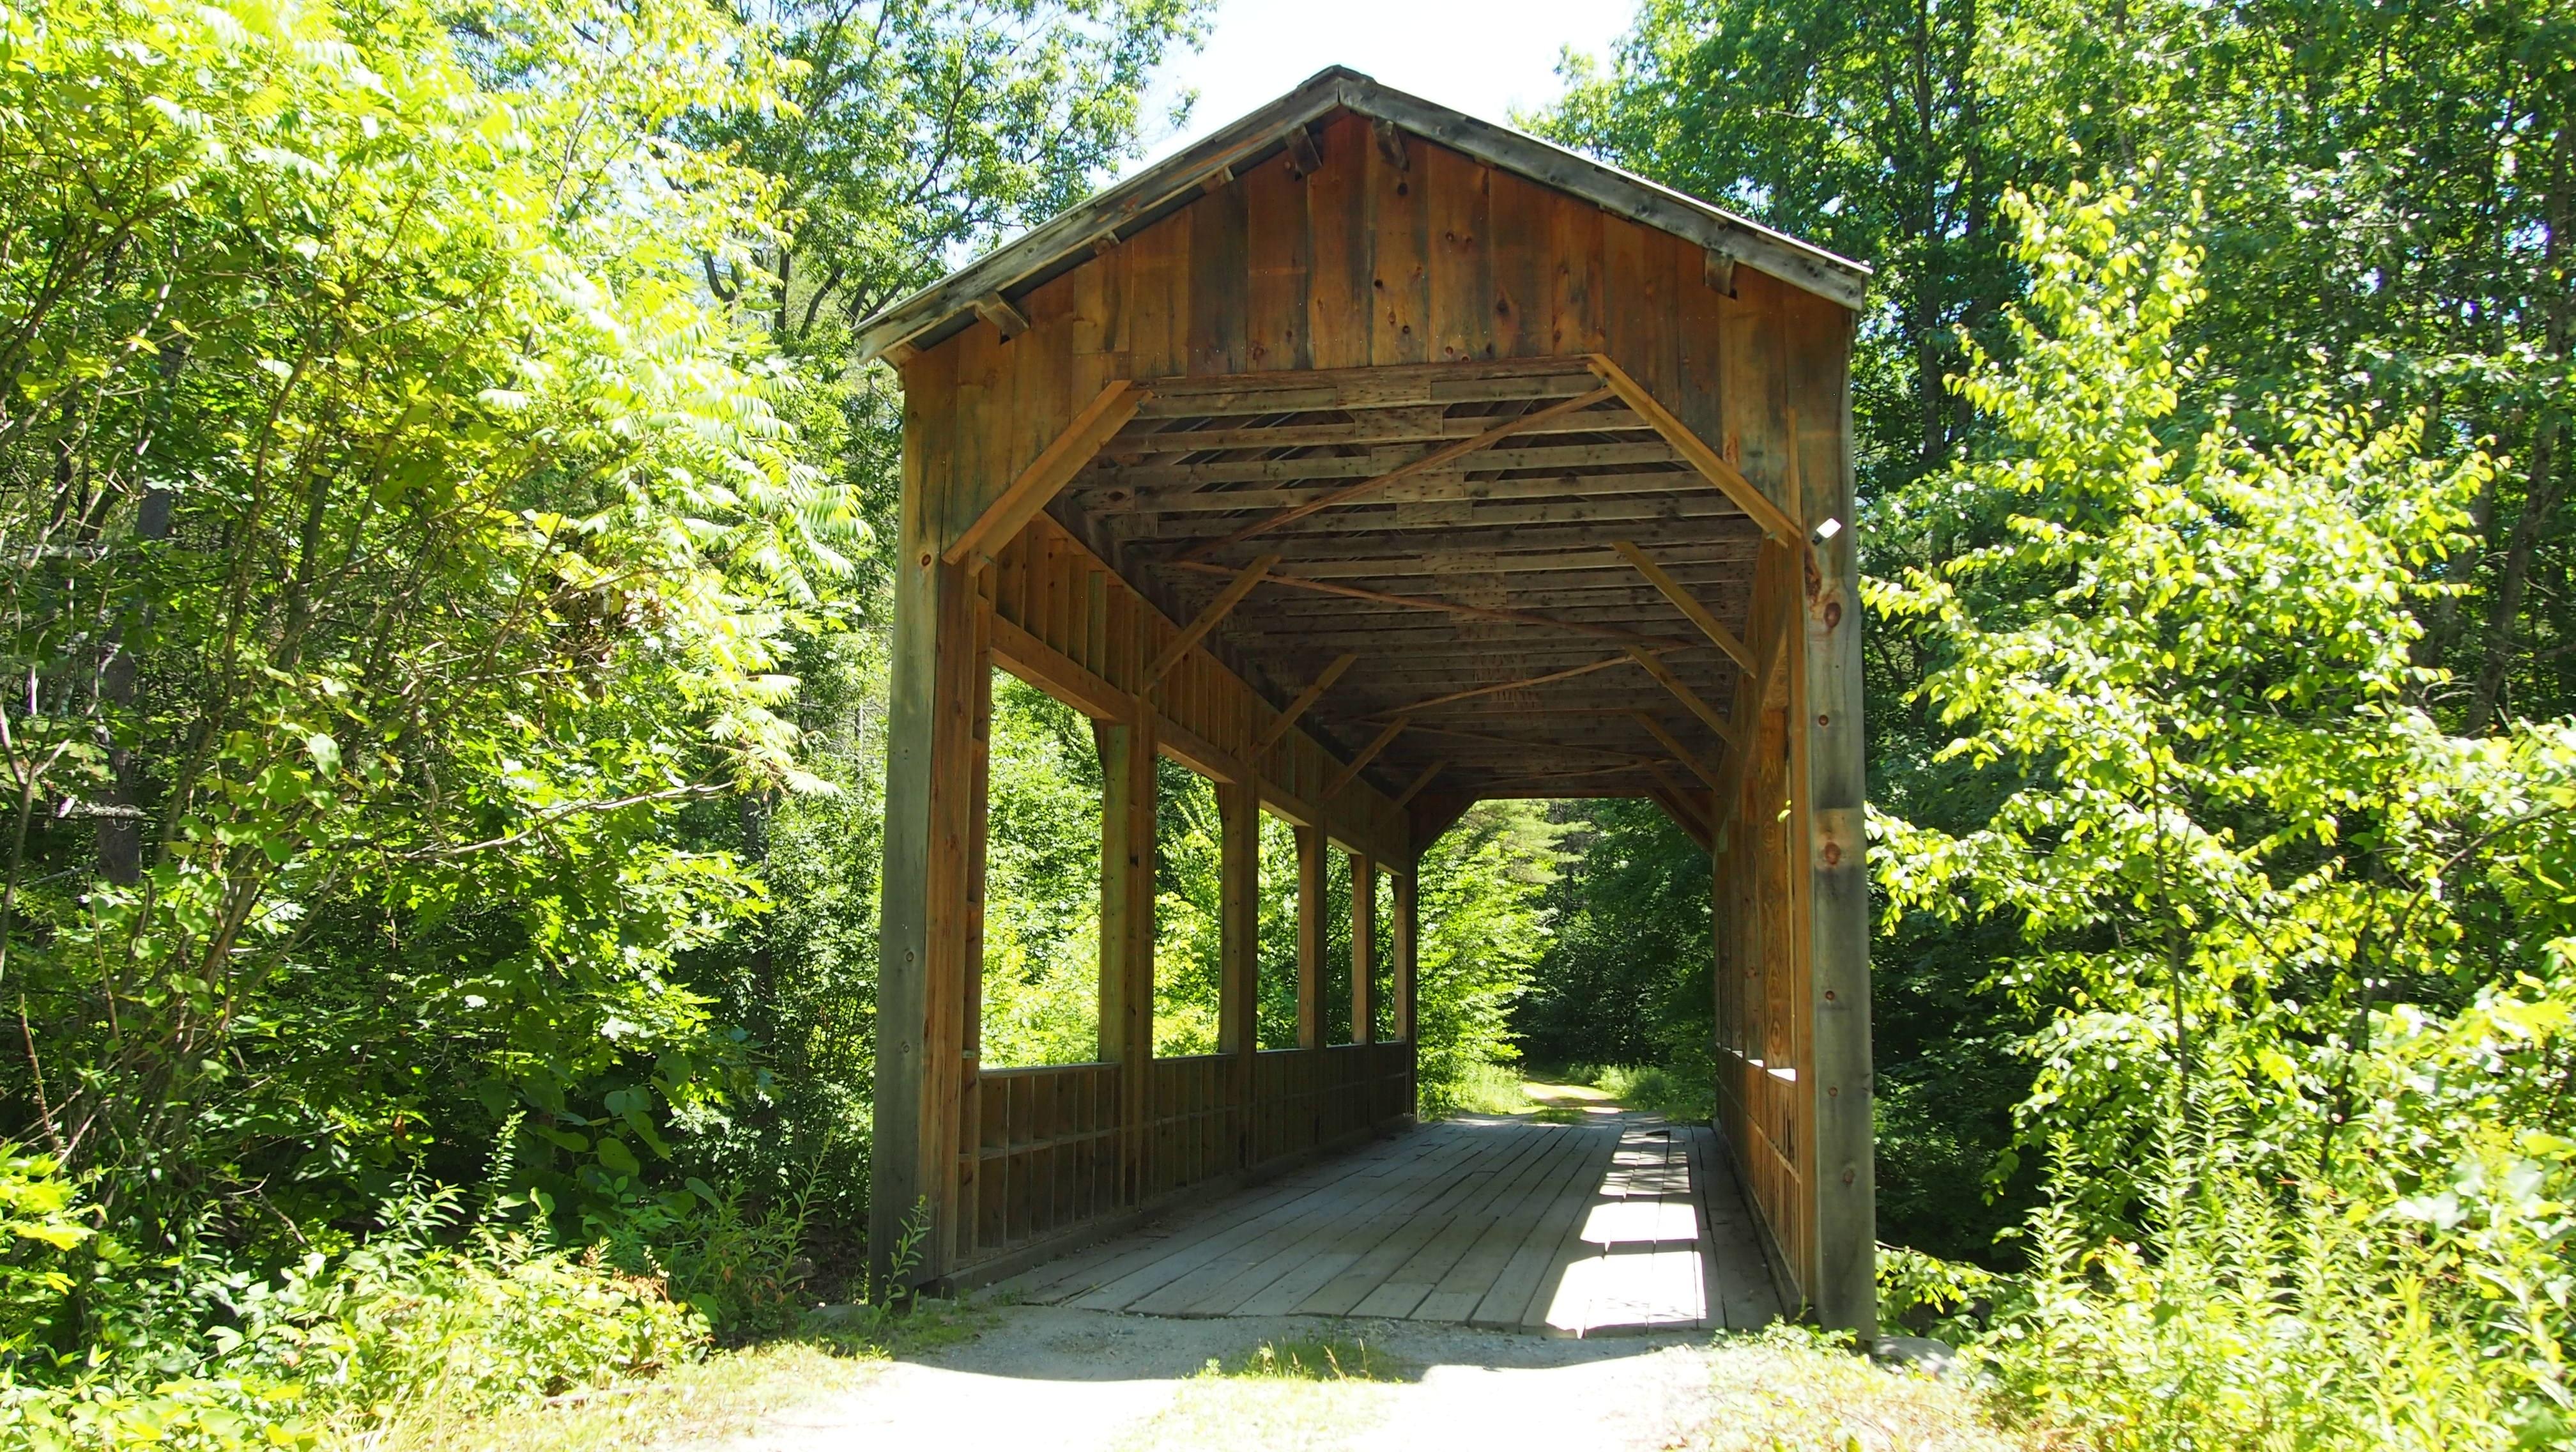 Fotos gratis : bosque, madera, puente, edificio, cabaña, Estados ...